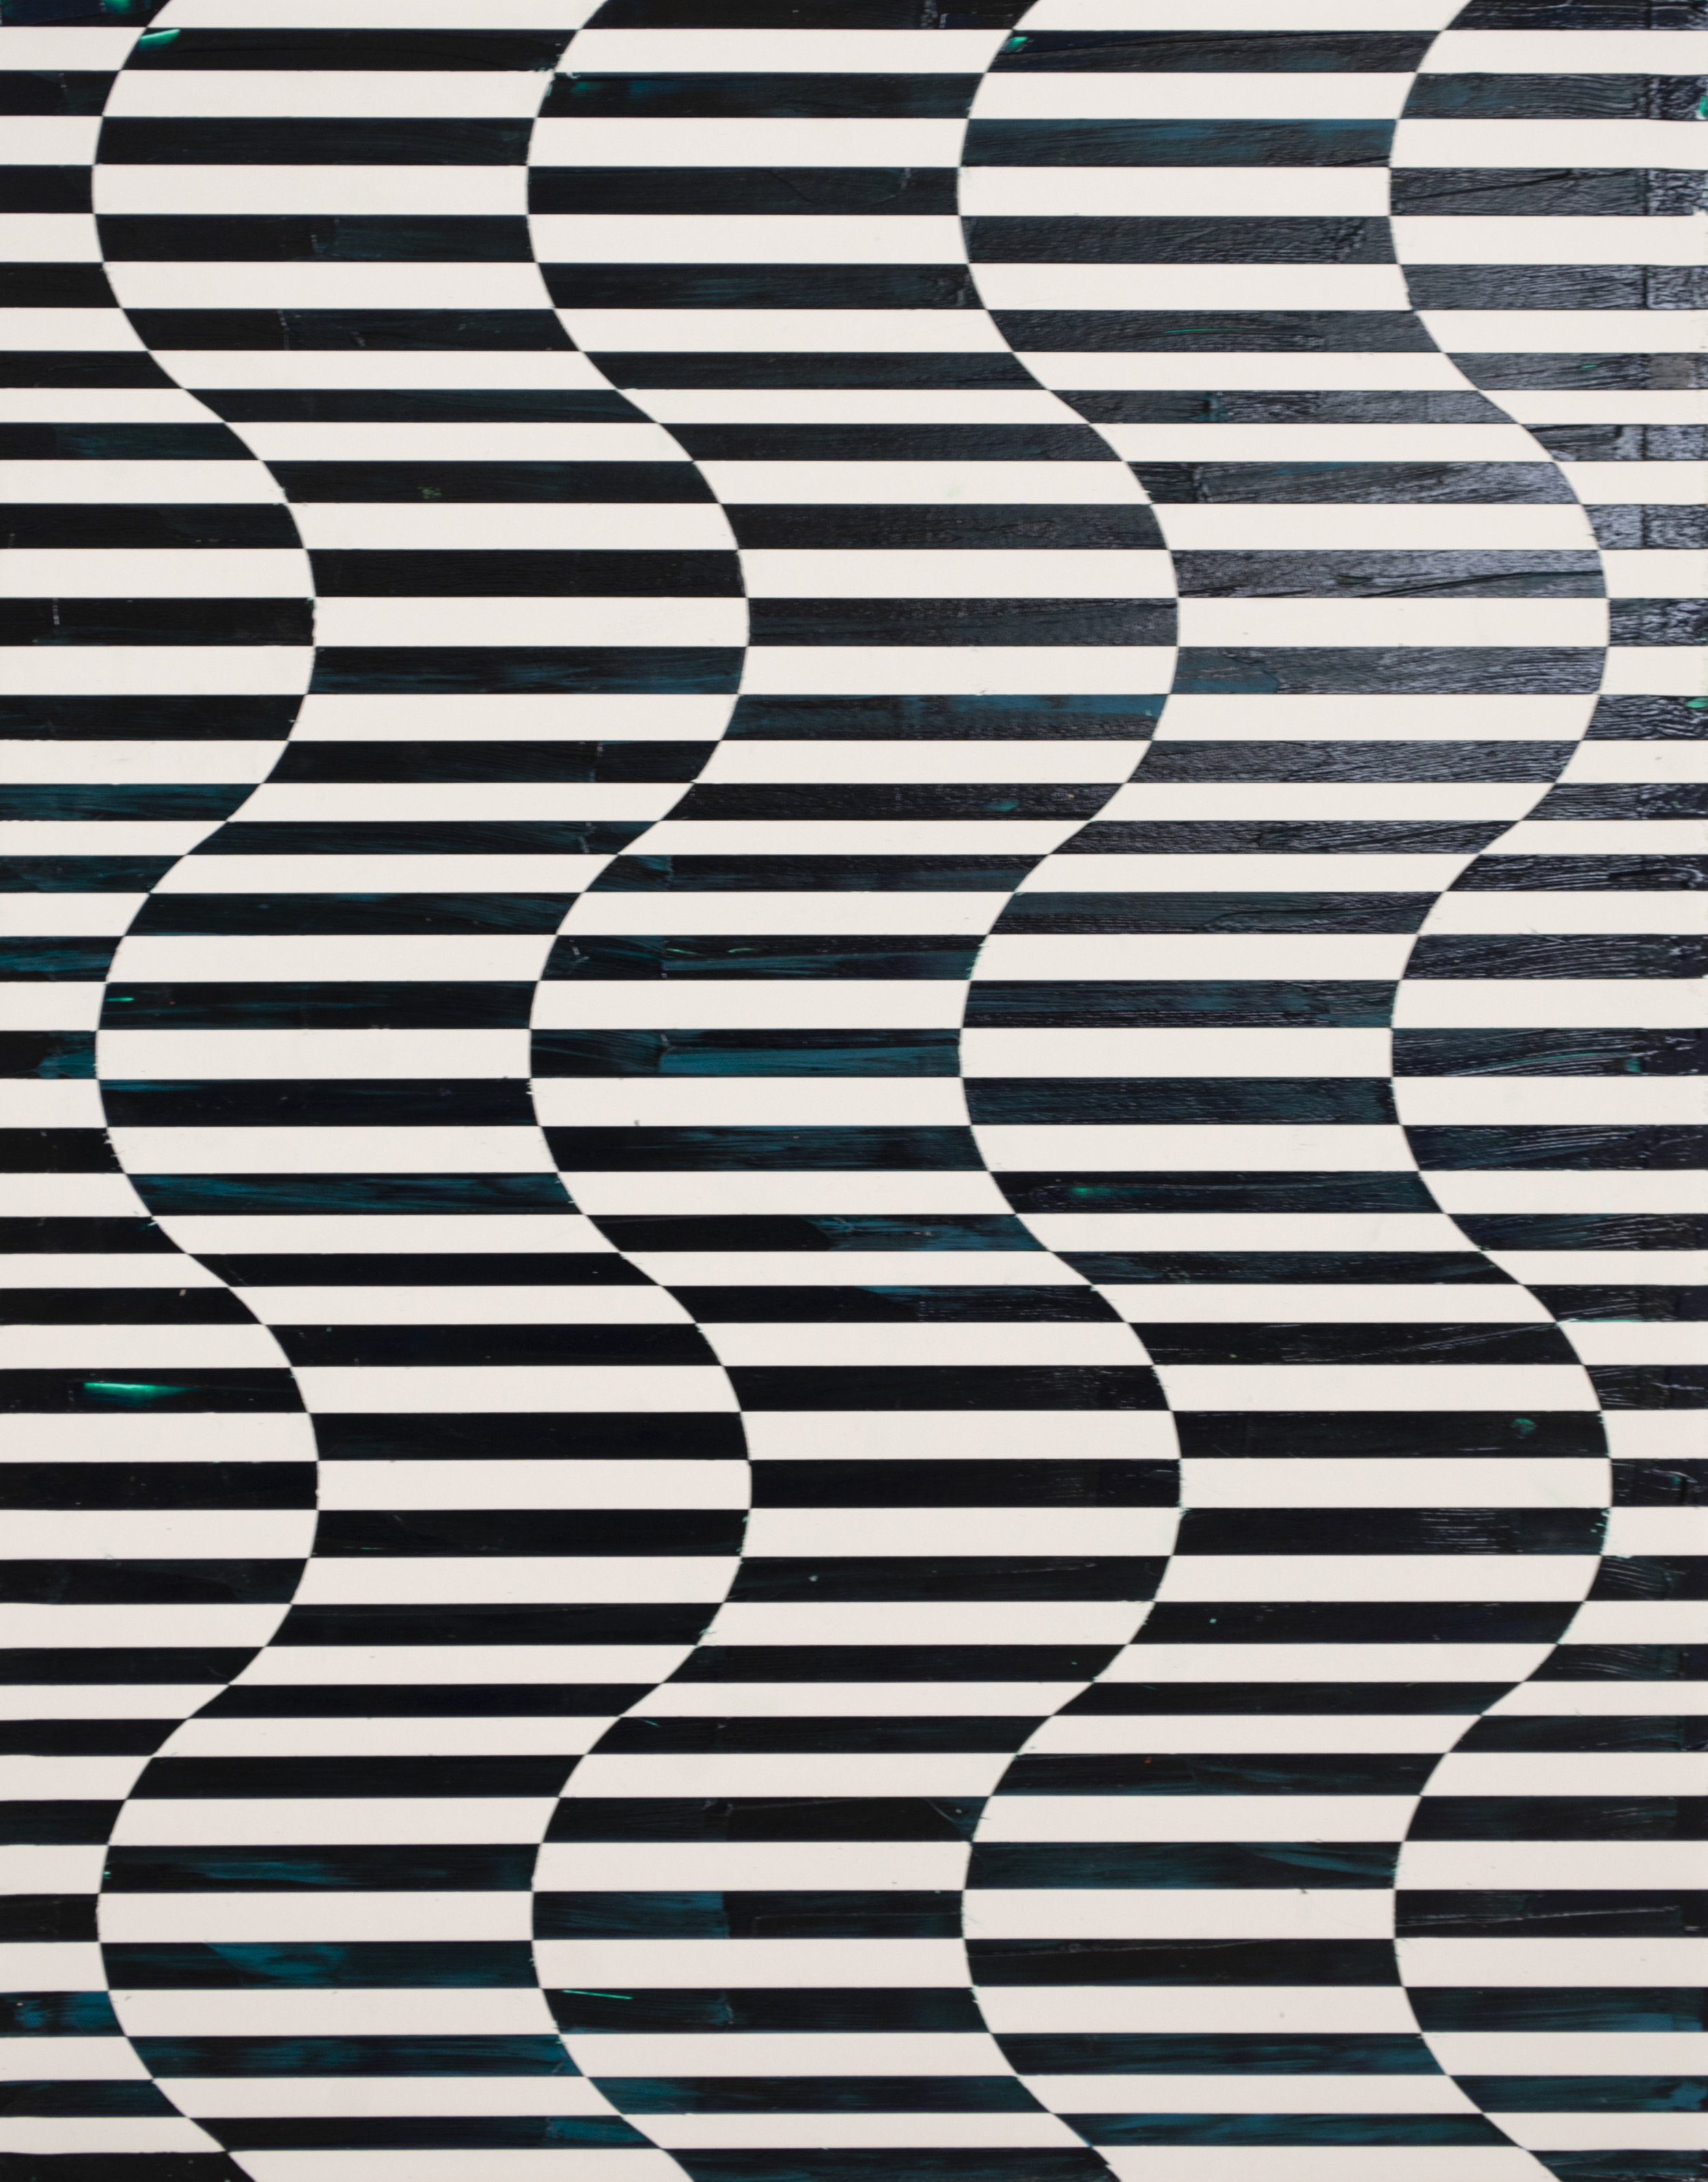 HUE Gallery of Contemporary Art - Sean Christopher Ward - Deep Jaded Waves - Acrylic on MDF - 11x14 - 2018 - $300.jpg